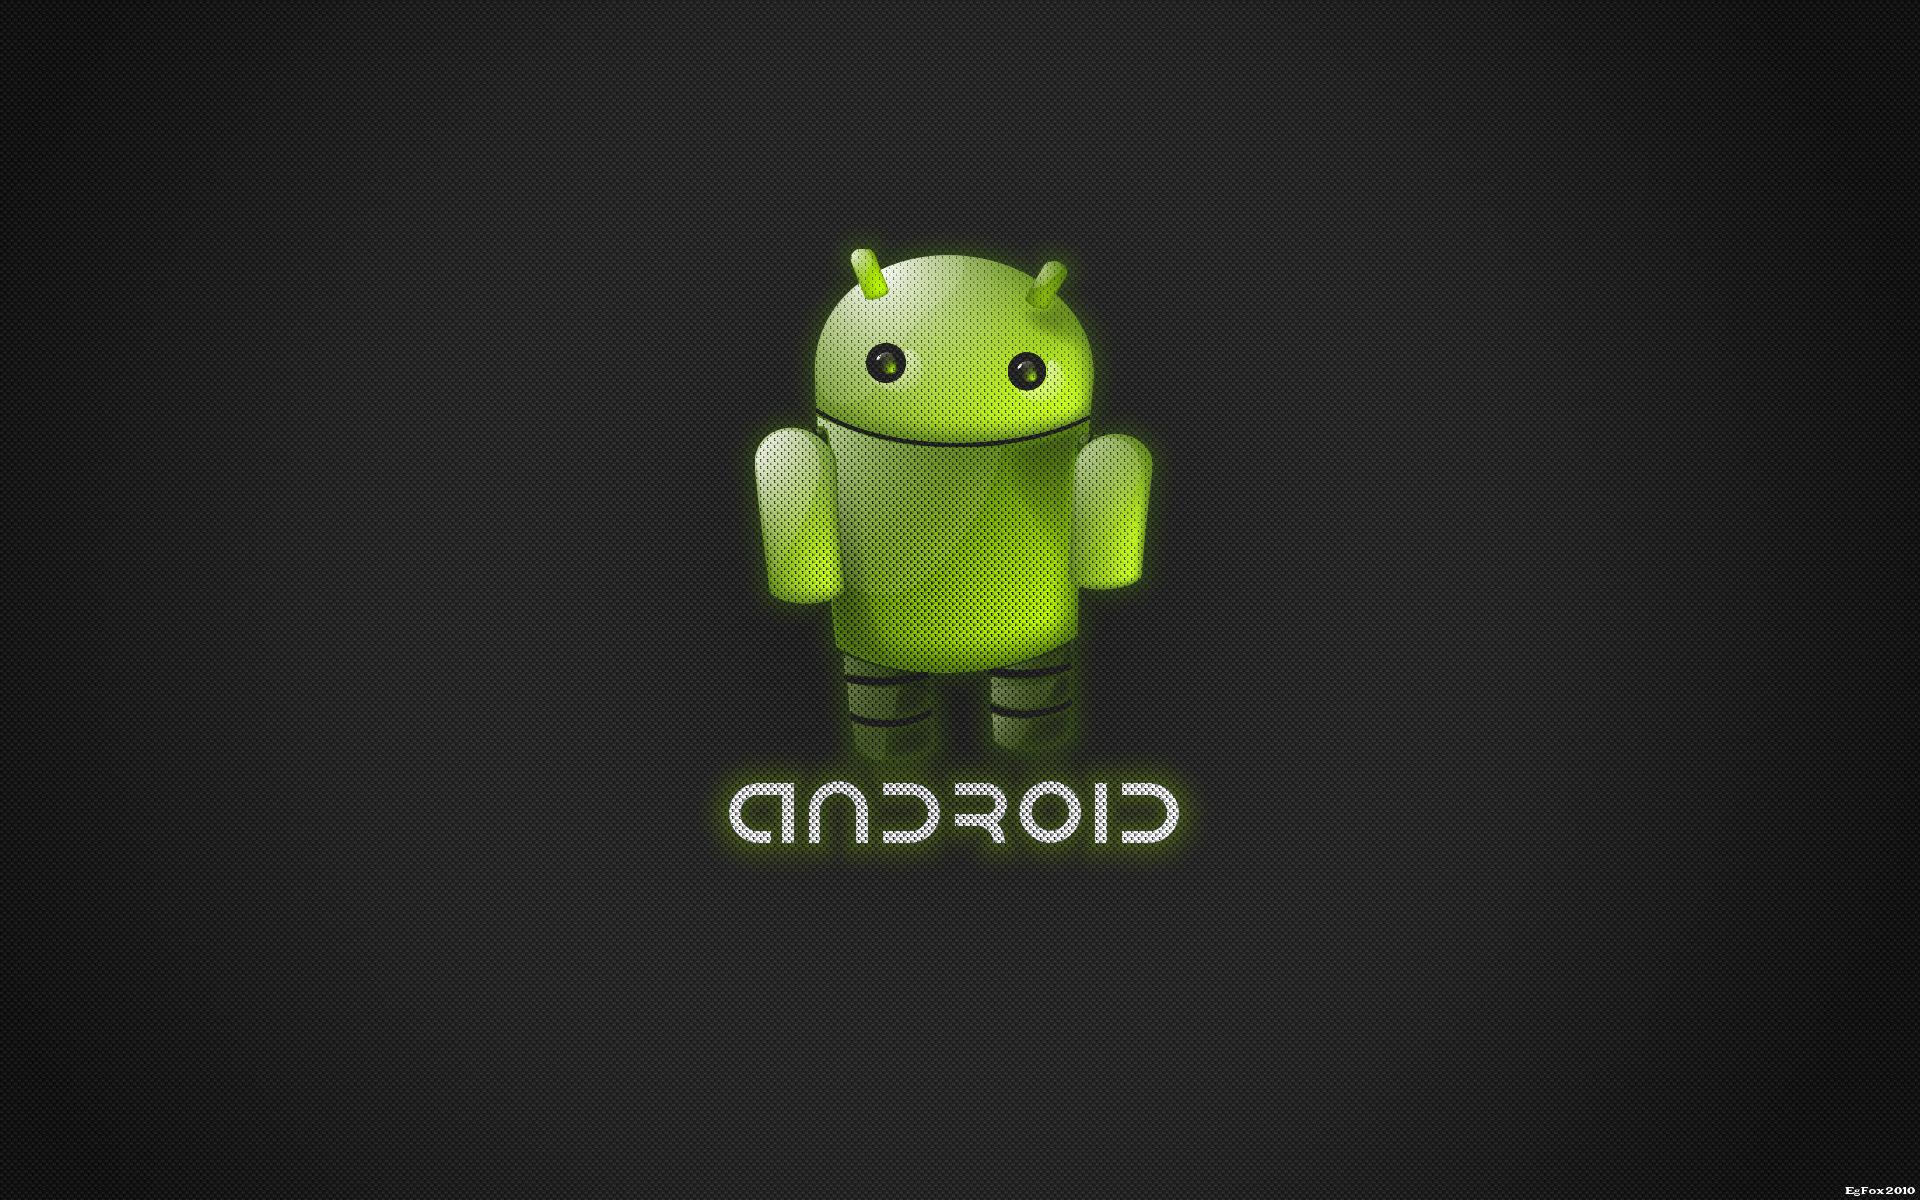 Sfondi desktop android hd in 3d sfondi hd gratis for Sfondi hd android